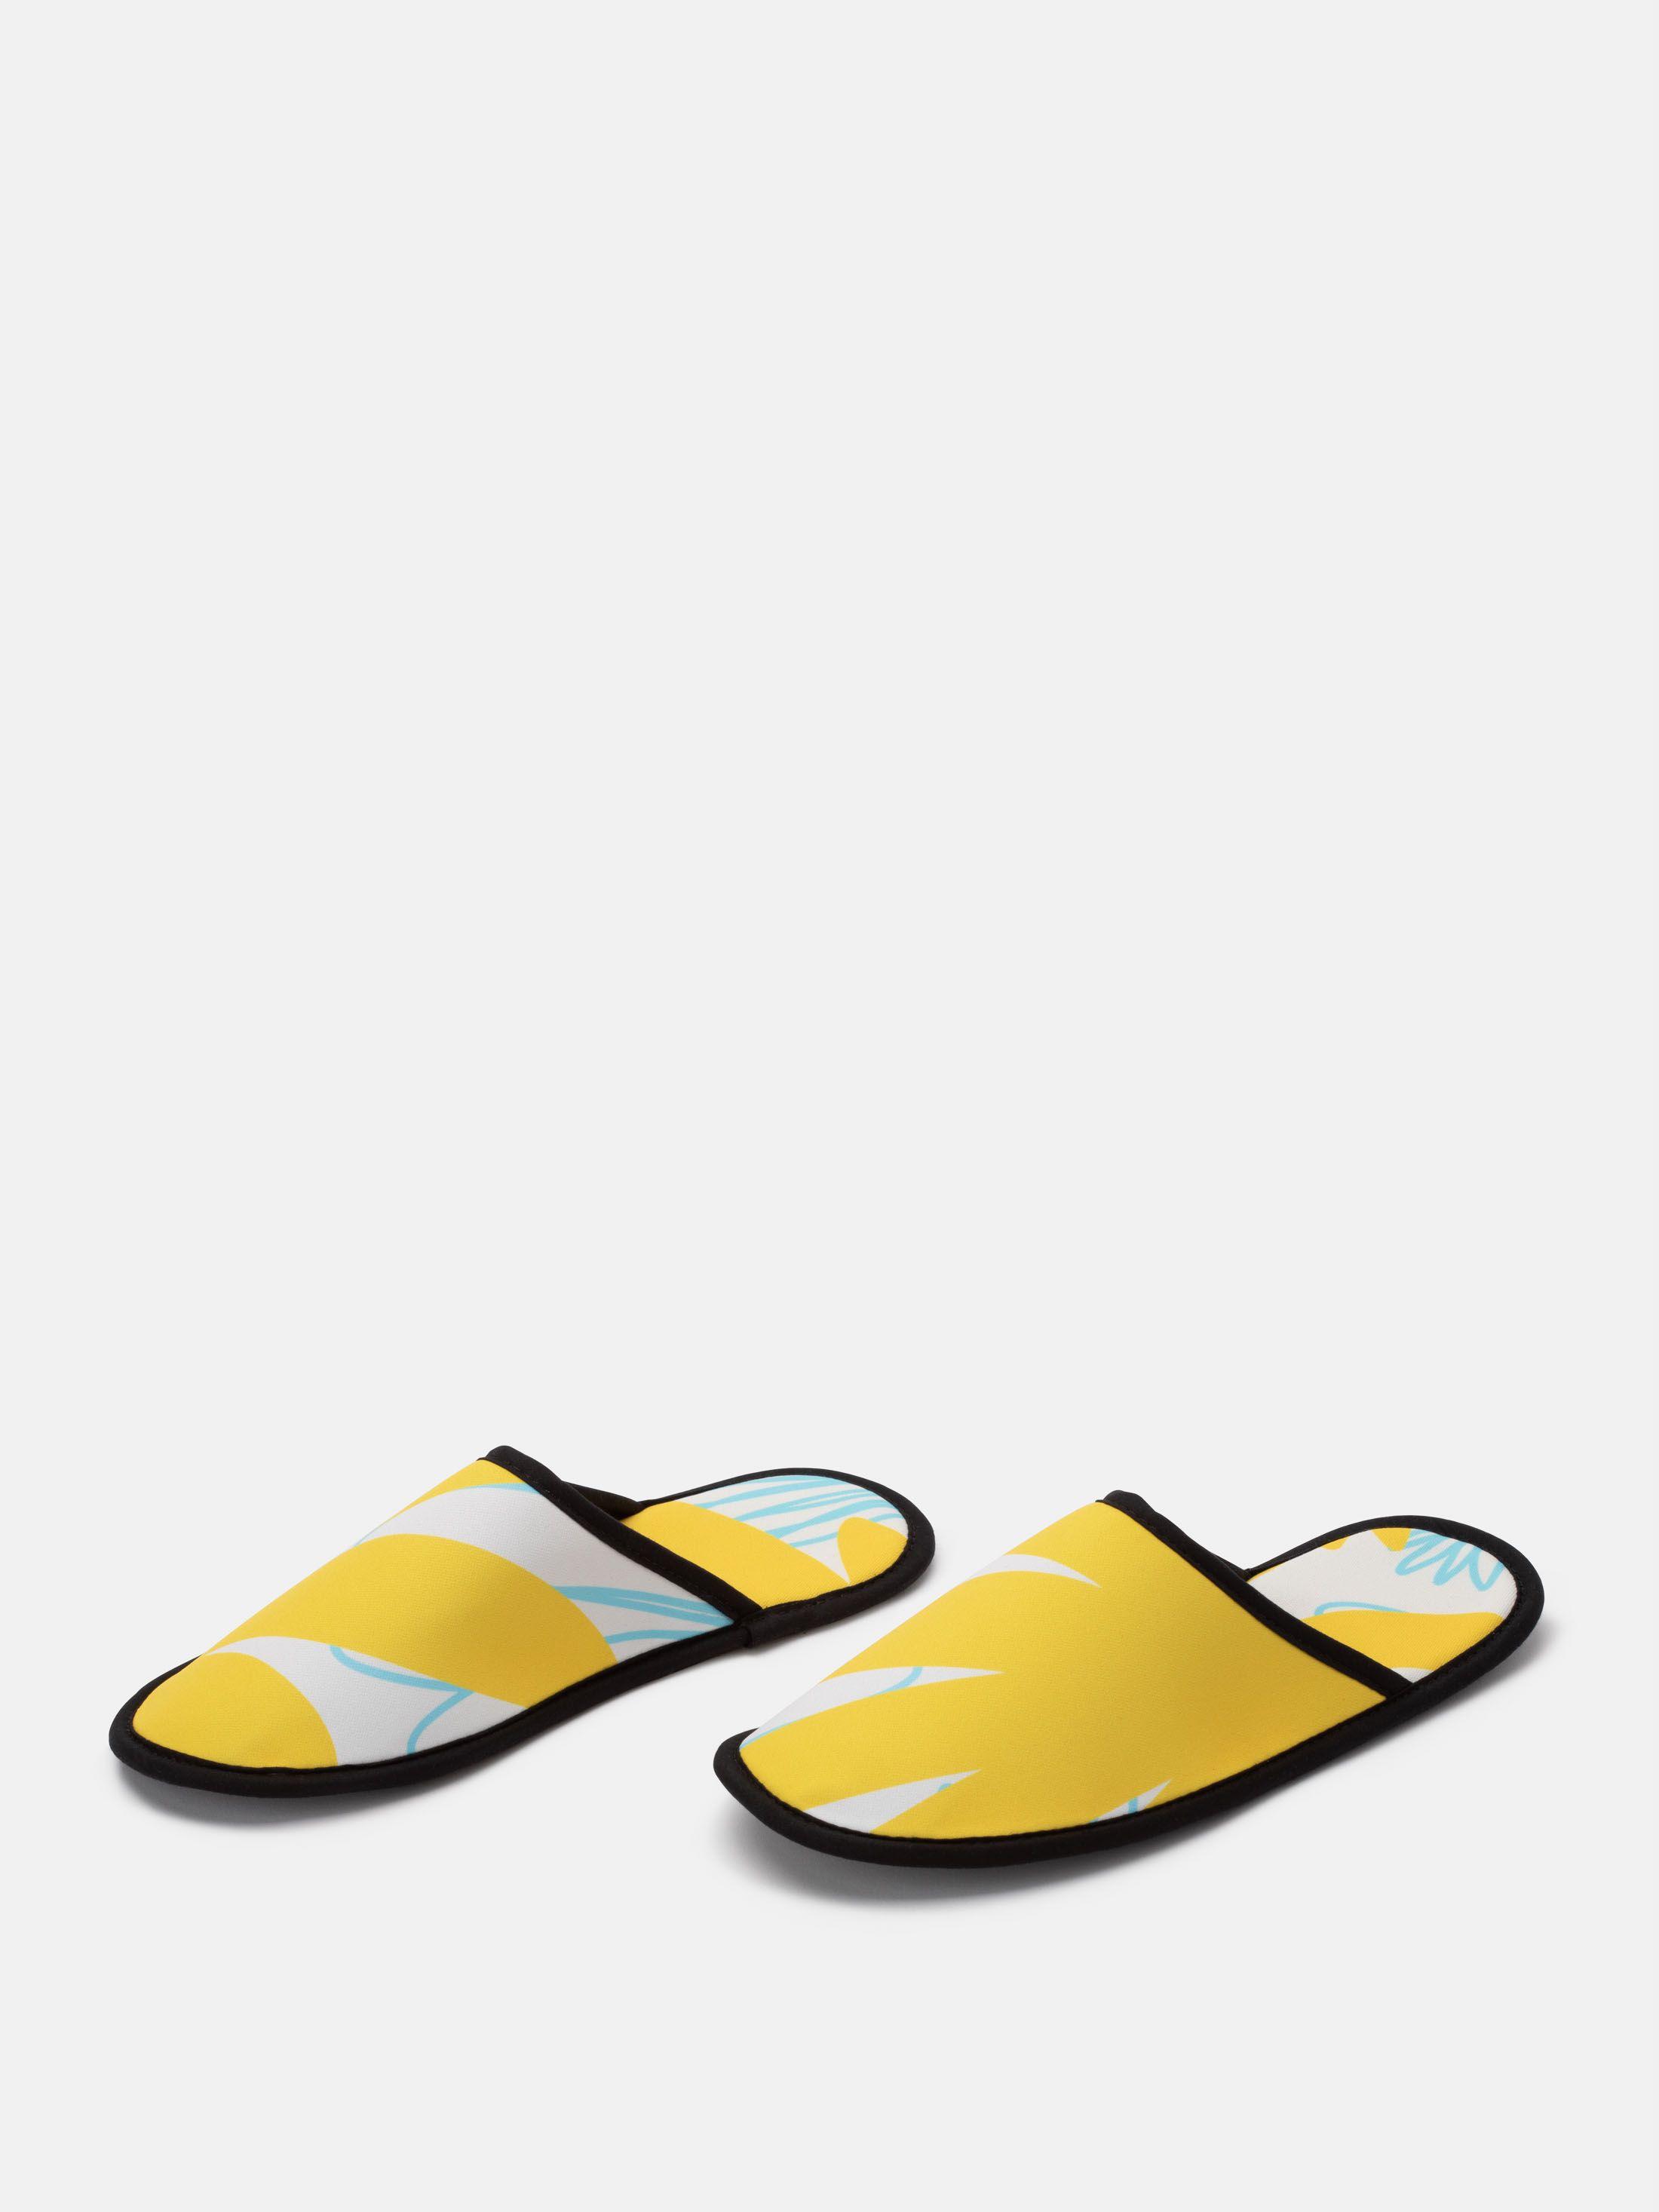 pantuflas personalizadas